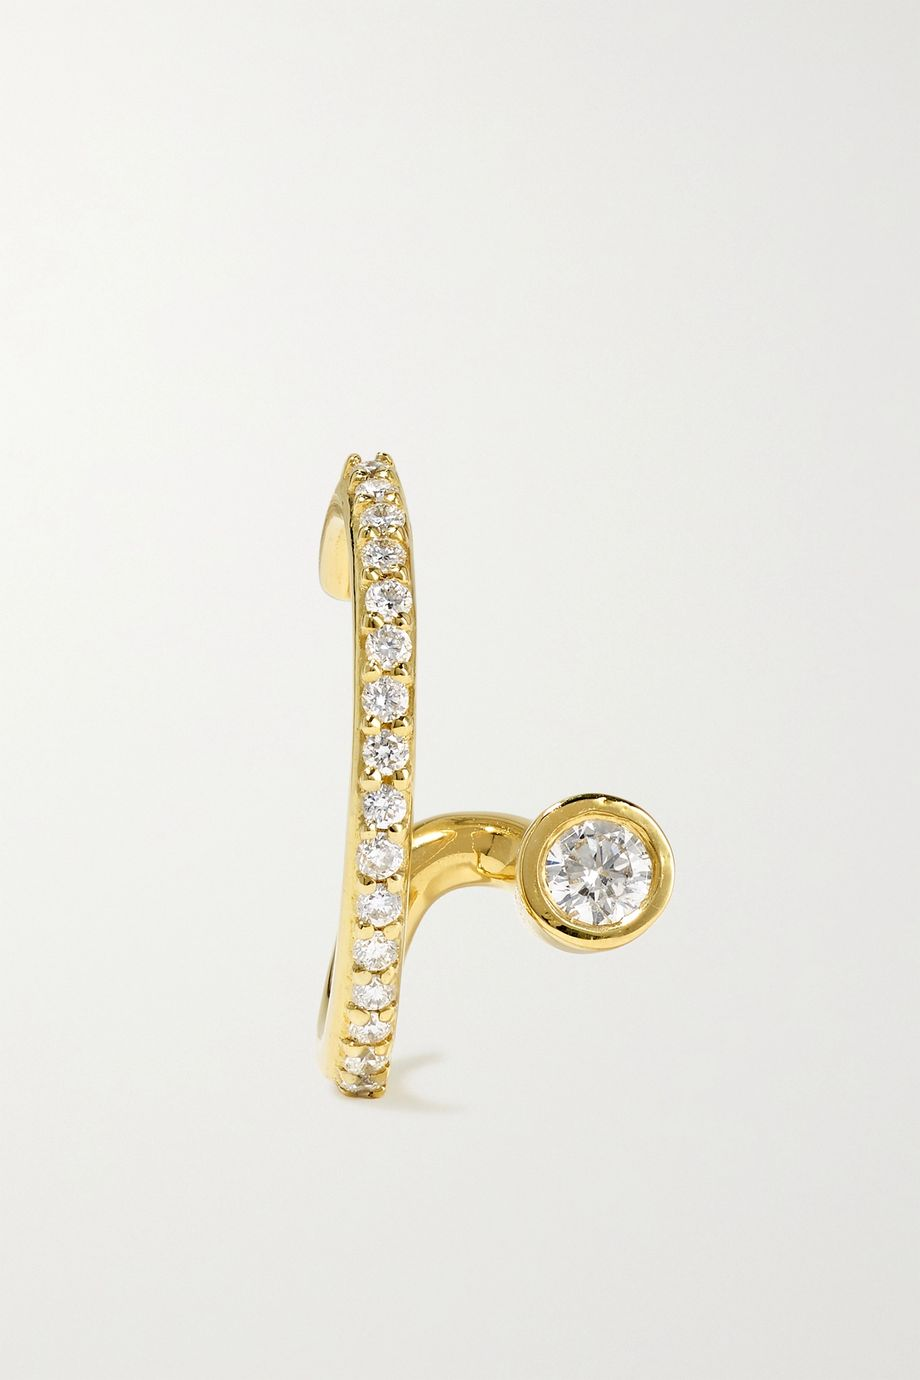 KATKIM Crescendo Flare gold diamond ear cuff